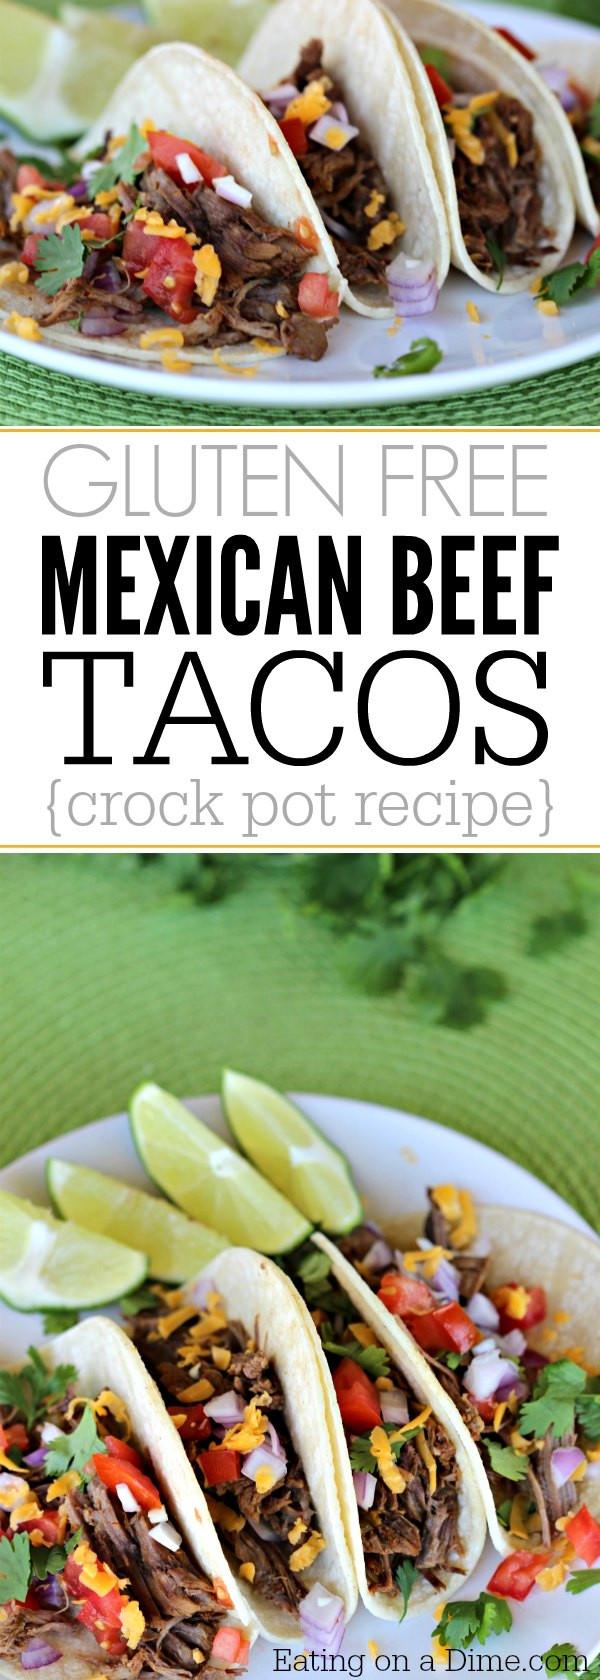 Easy Gluten Free Crockpot Recipes  Gluten Free Crock pot Mexican Shredded Beef Taco Recipe